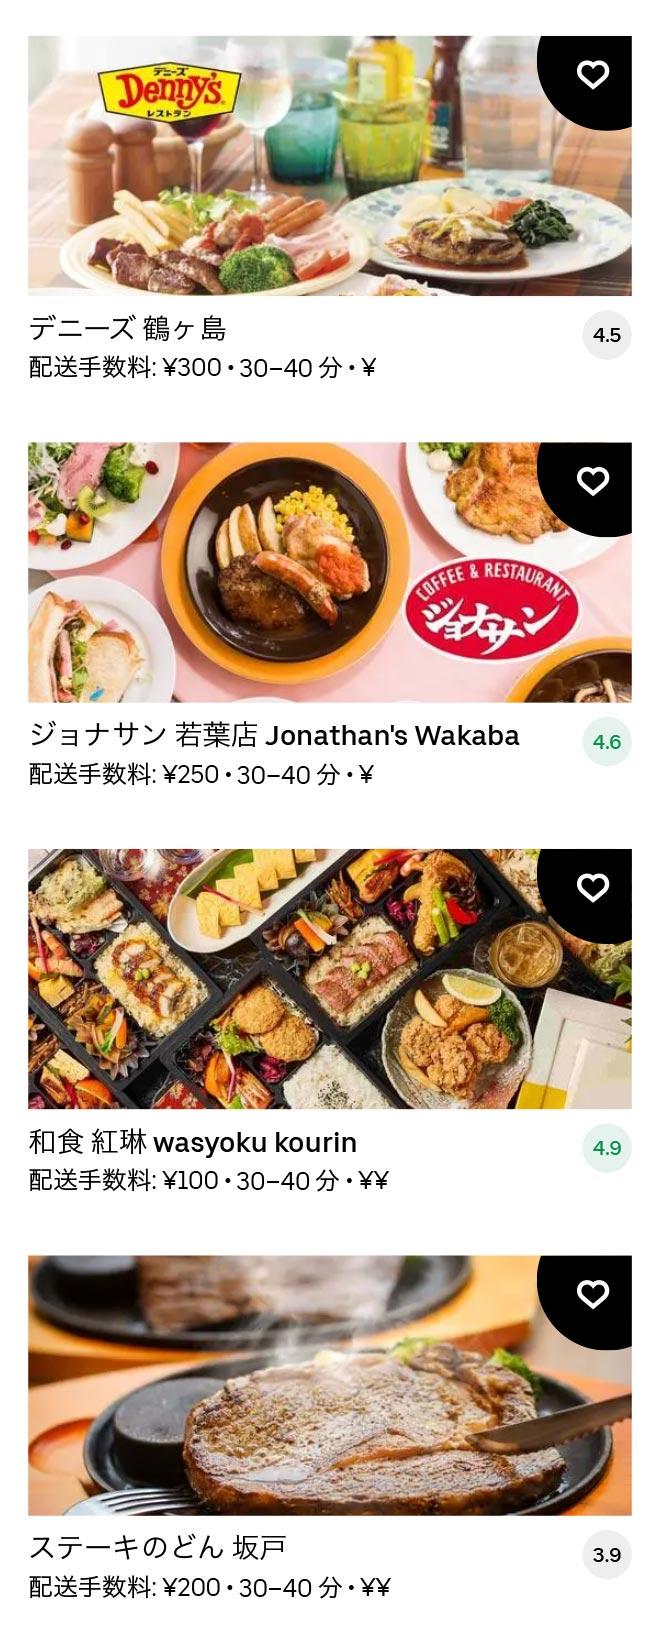 Sakado menu 2101 08